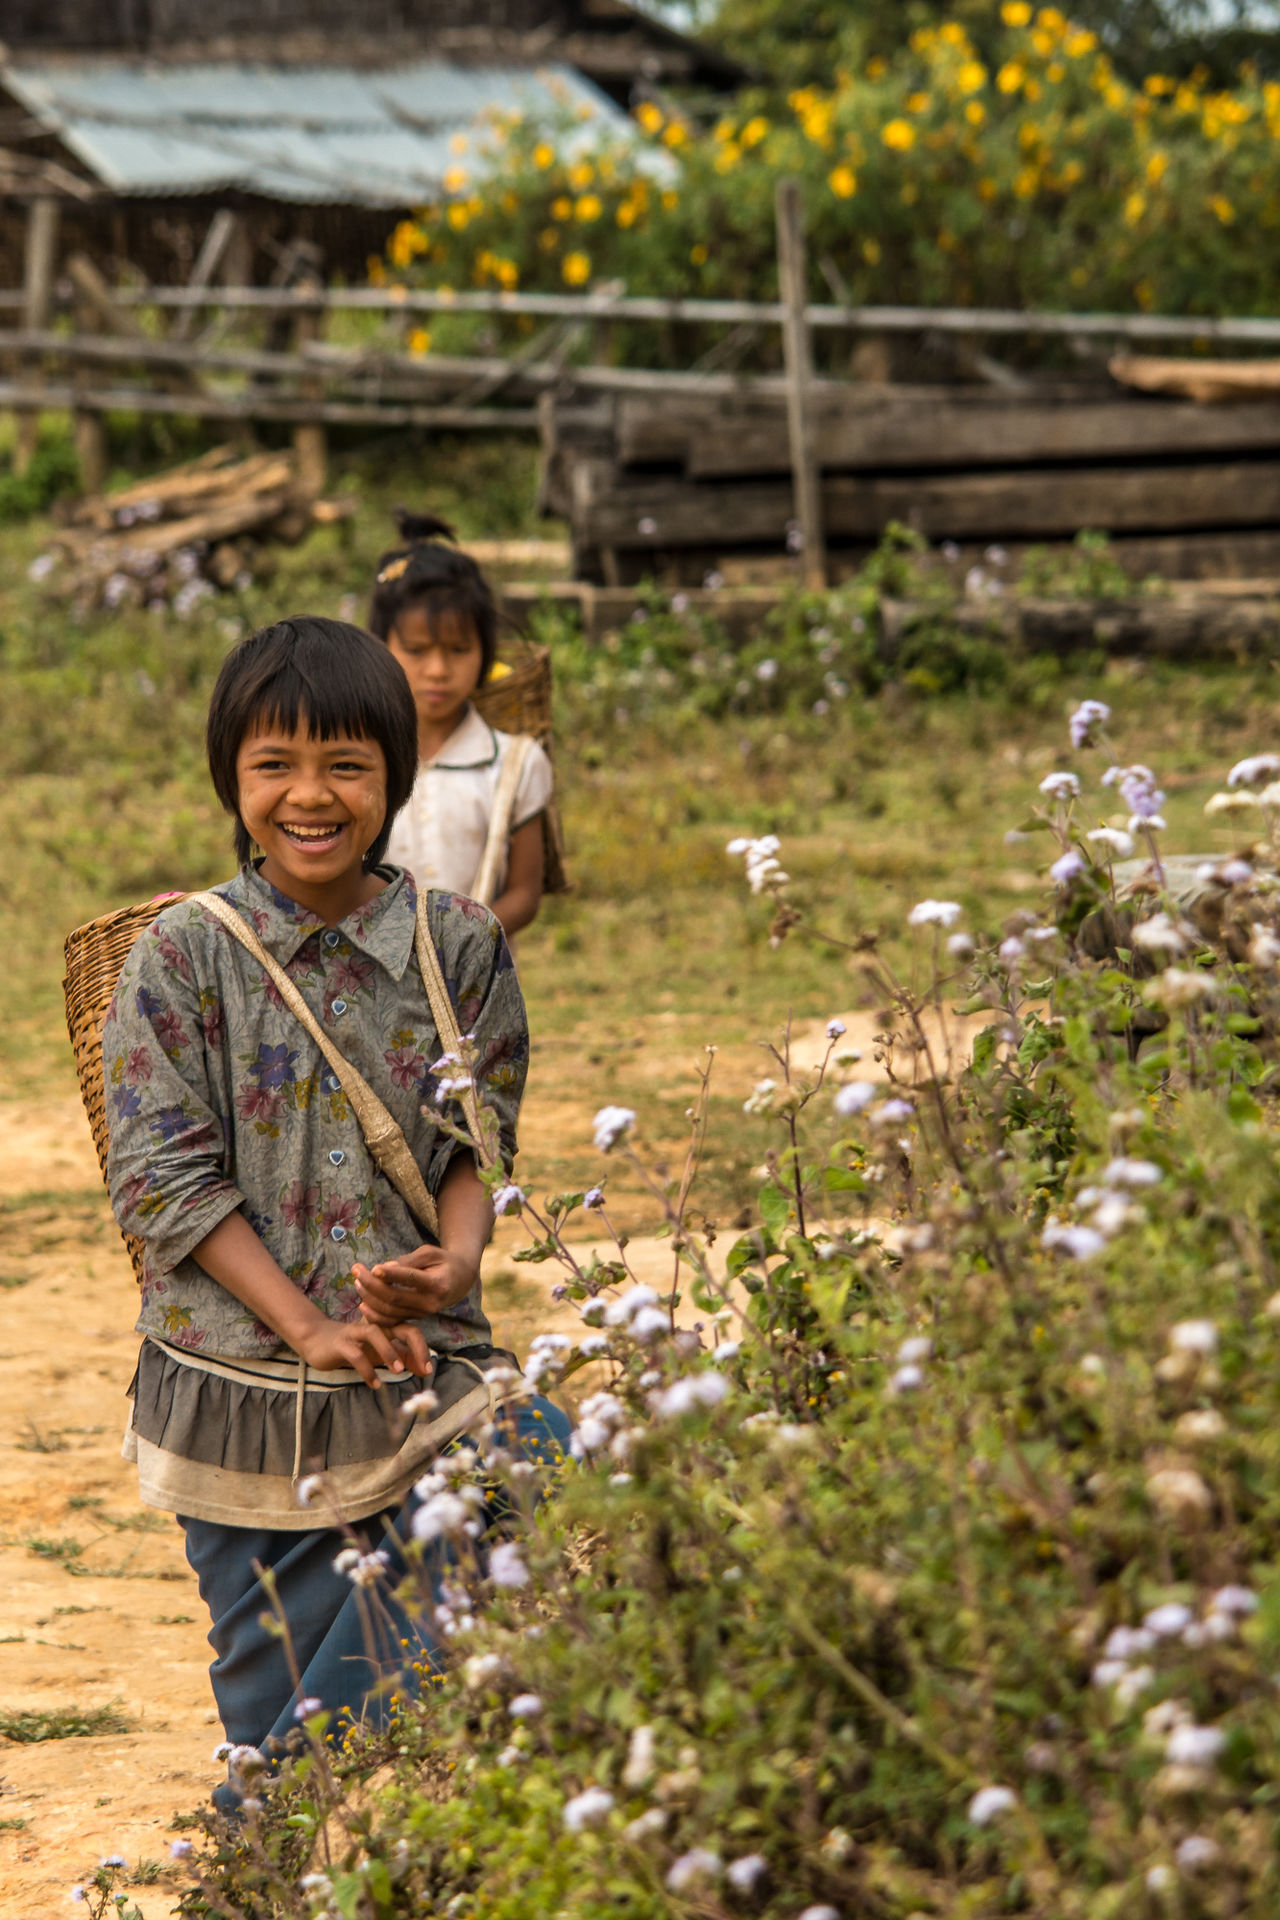 Burma Childhood Children Playing Hill People Innocence Lock Myanmar Person Plants Playing SE Asia Tribal